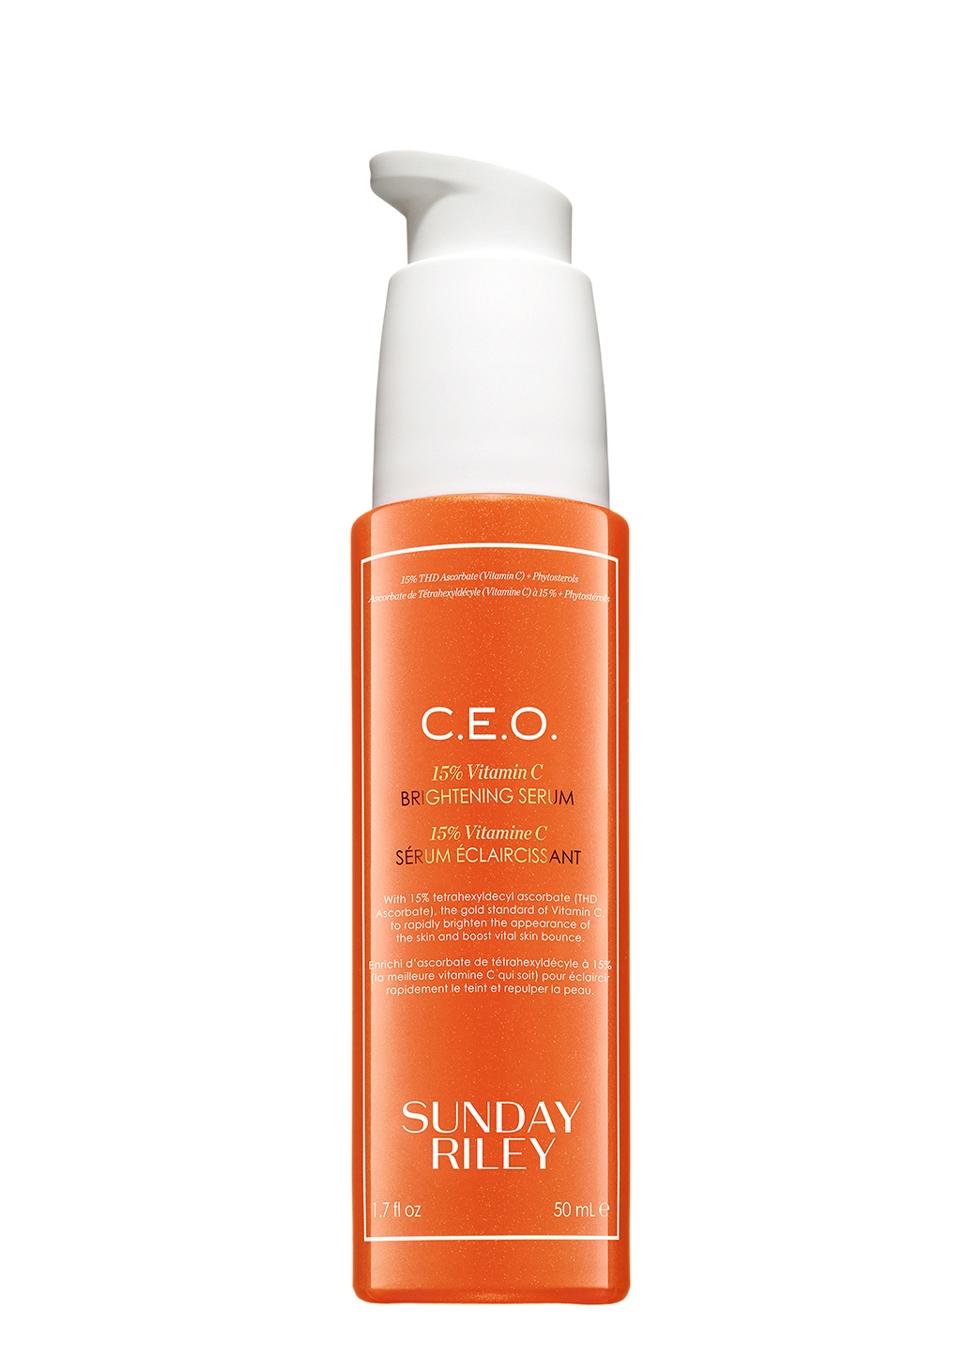 C.E.O. 15% Vitamin C Brightening Serum 50ml